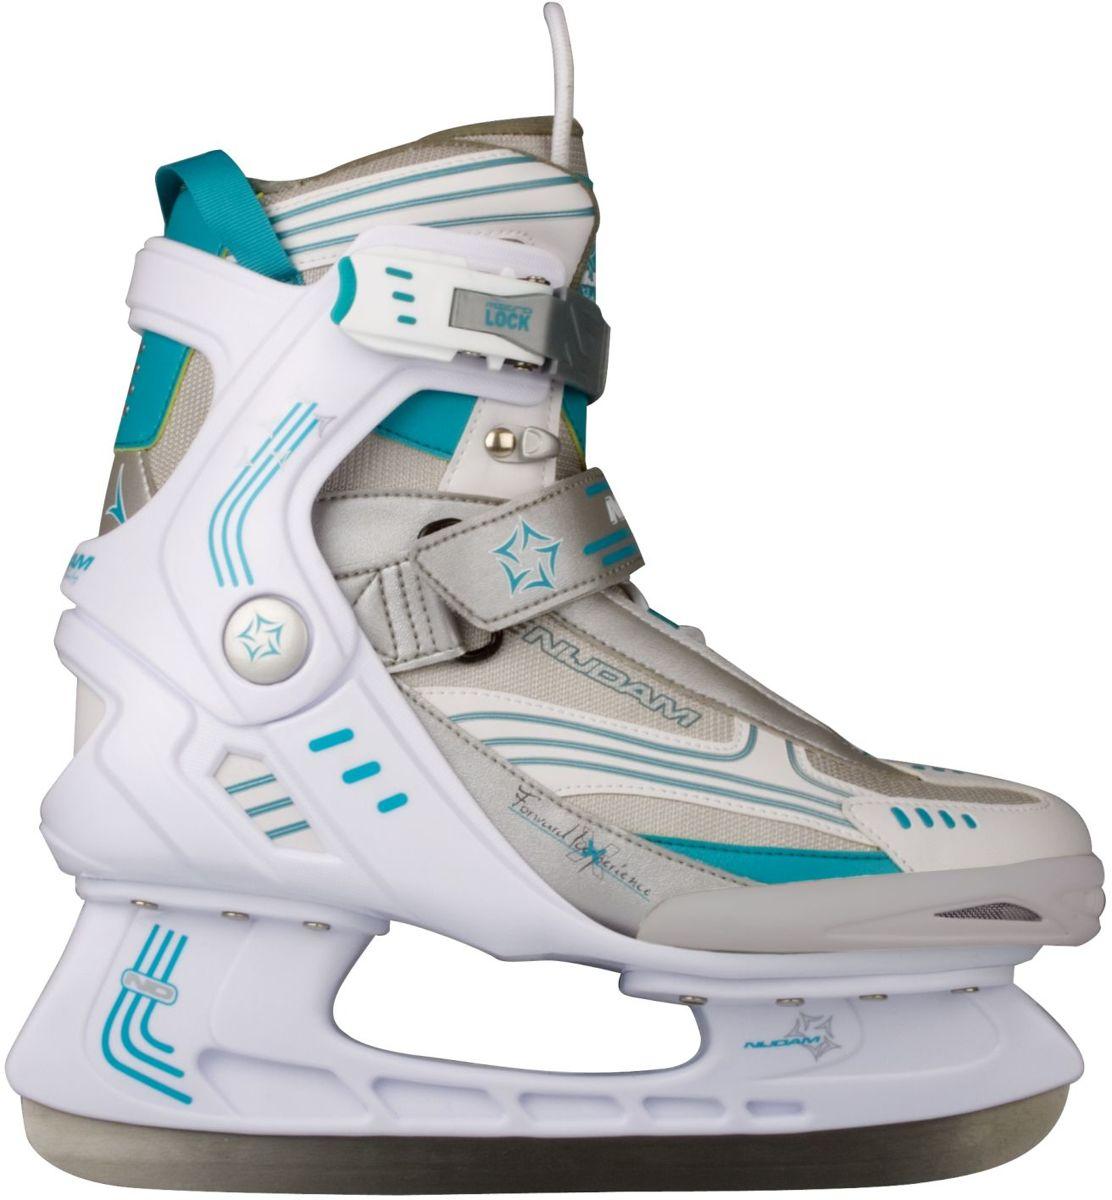 Nijdam 3353 Ijshockeyschaats - Semi-Softboot - Wit/Turquoise - Maat 37